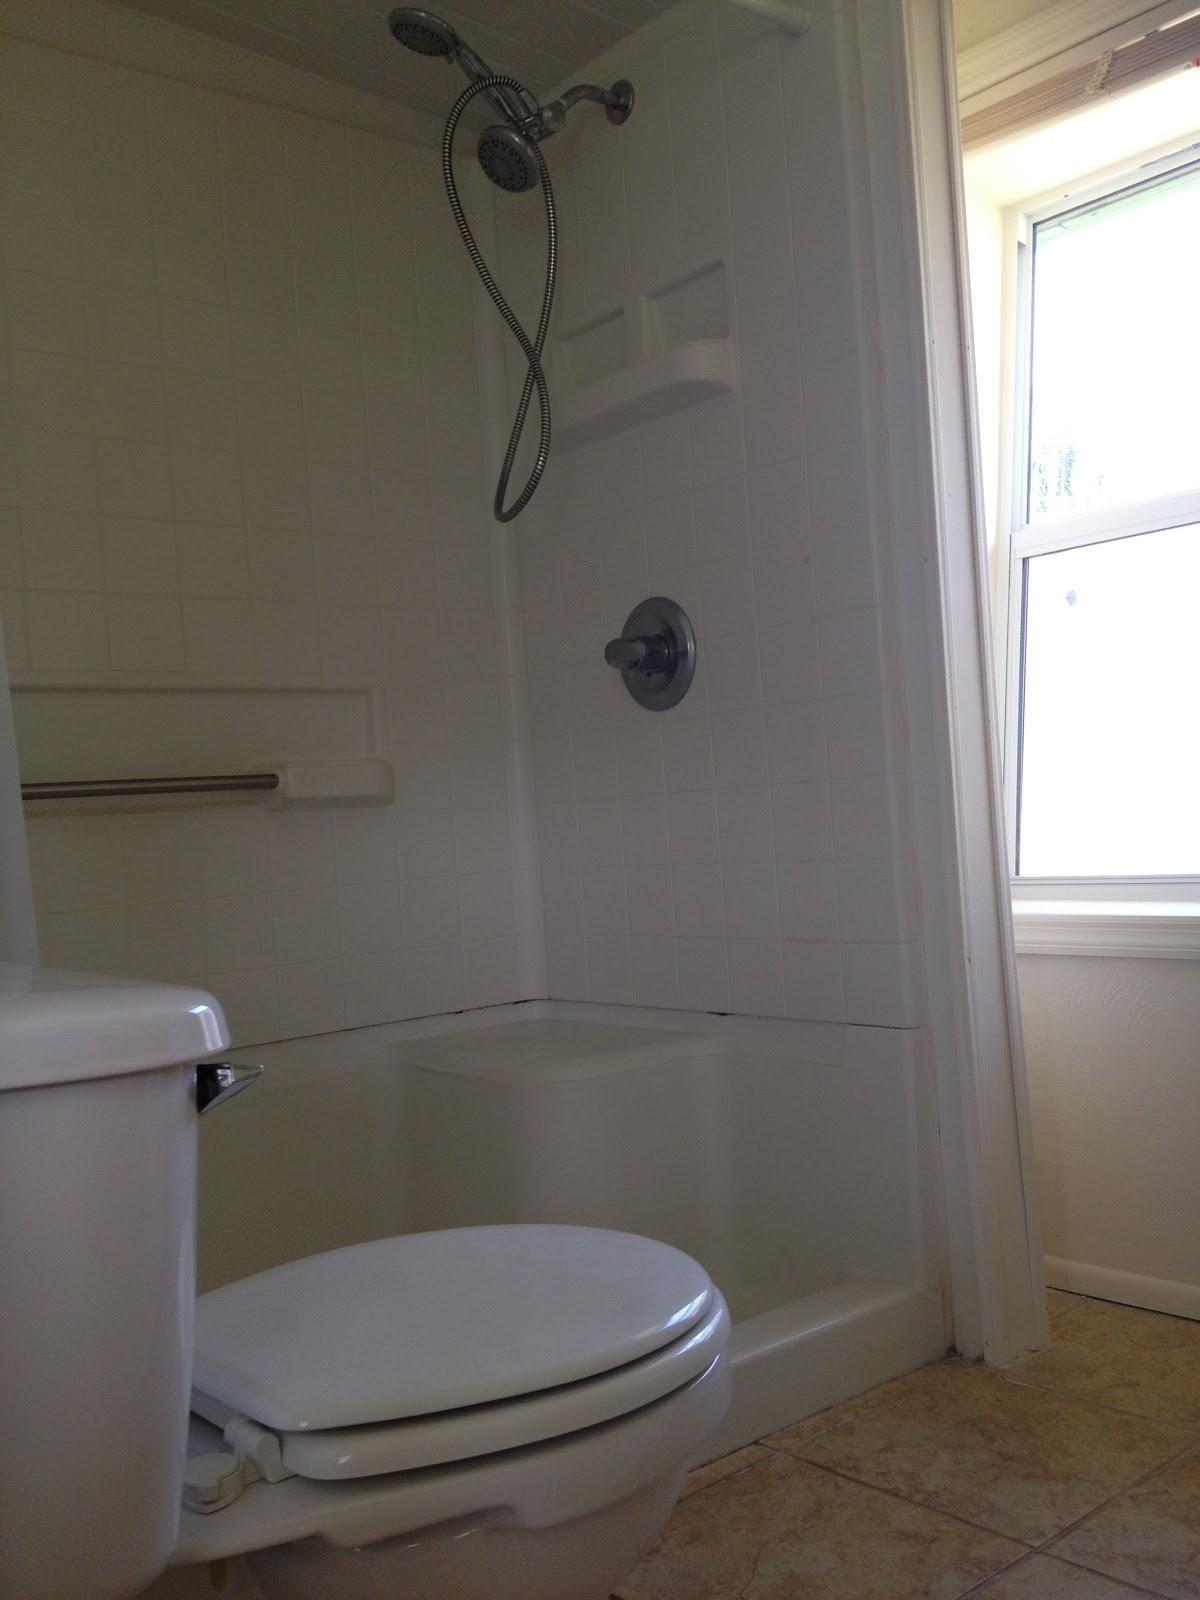 Tropical Trail Villa Sold 2 Bedroom 2 Bath Mobile Home For Sale 8 000